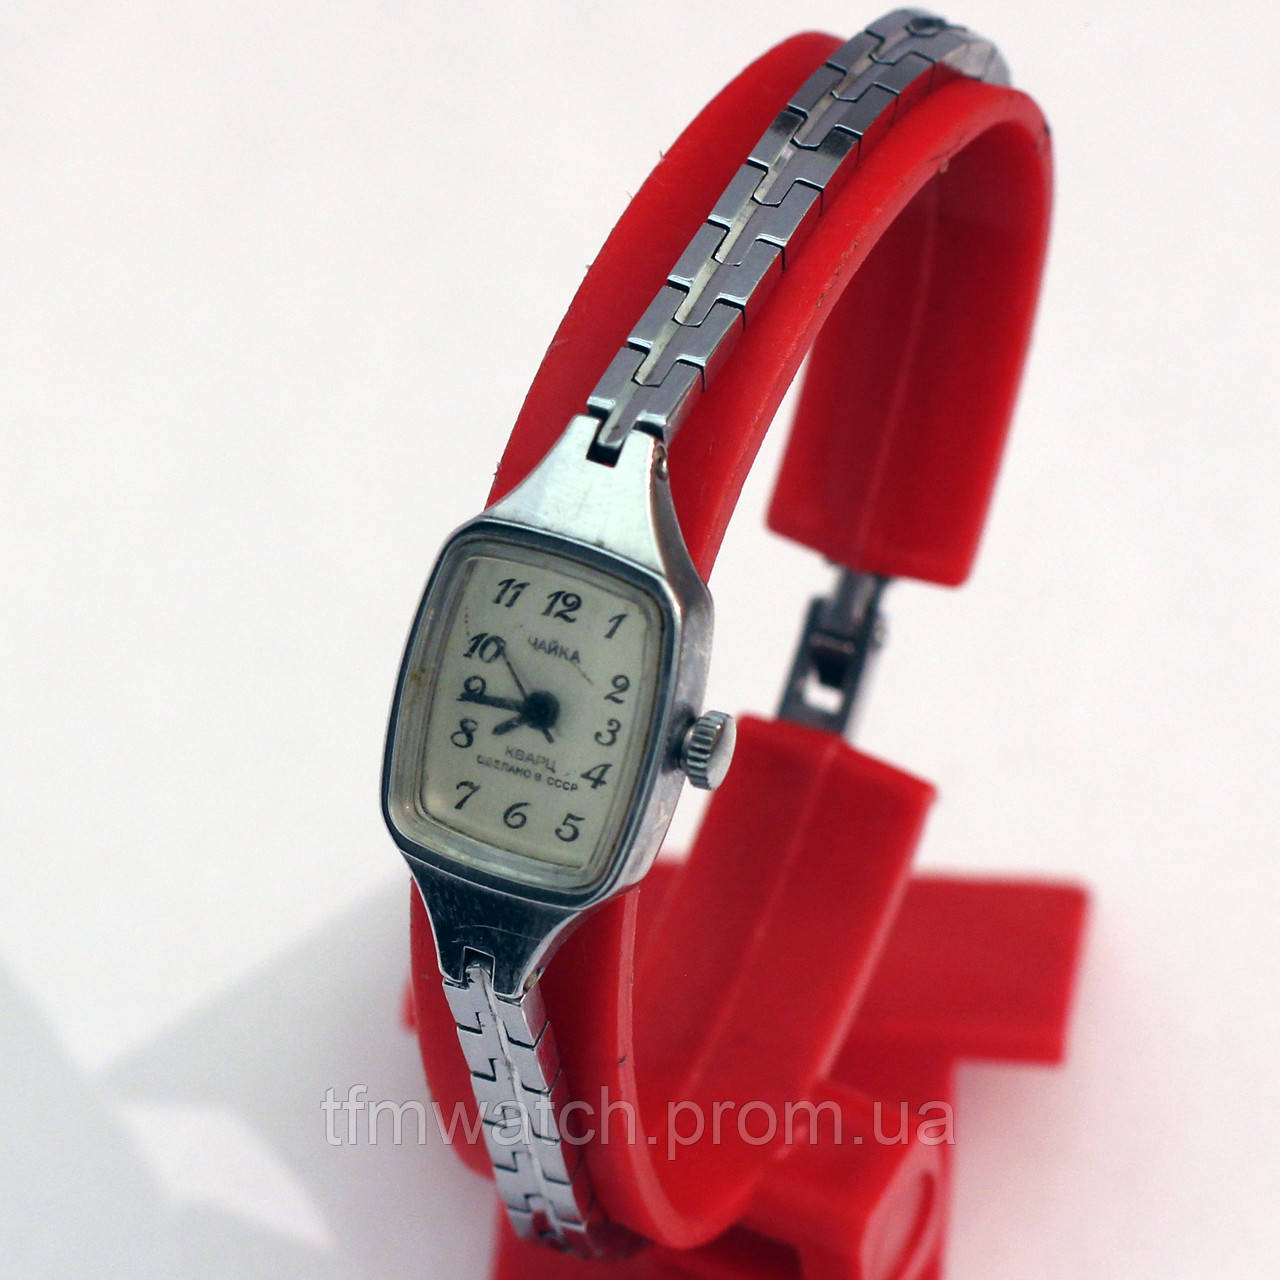 Кварцевые женские часы Чайка